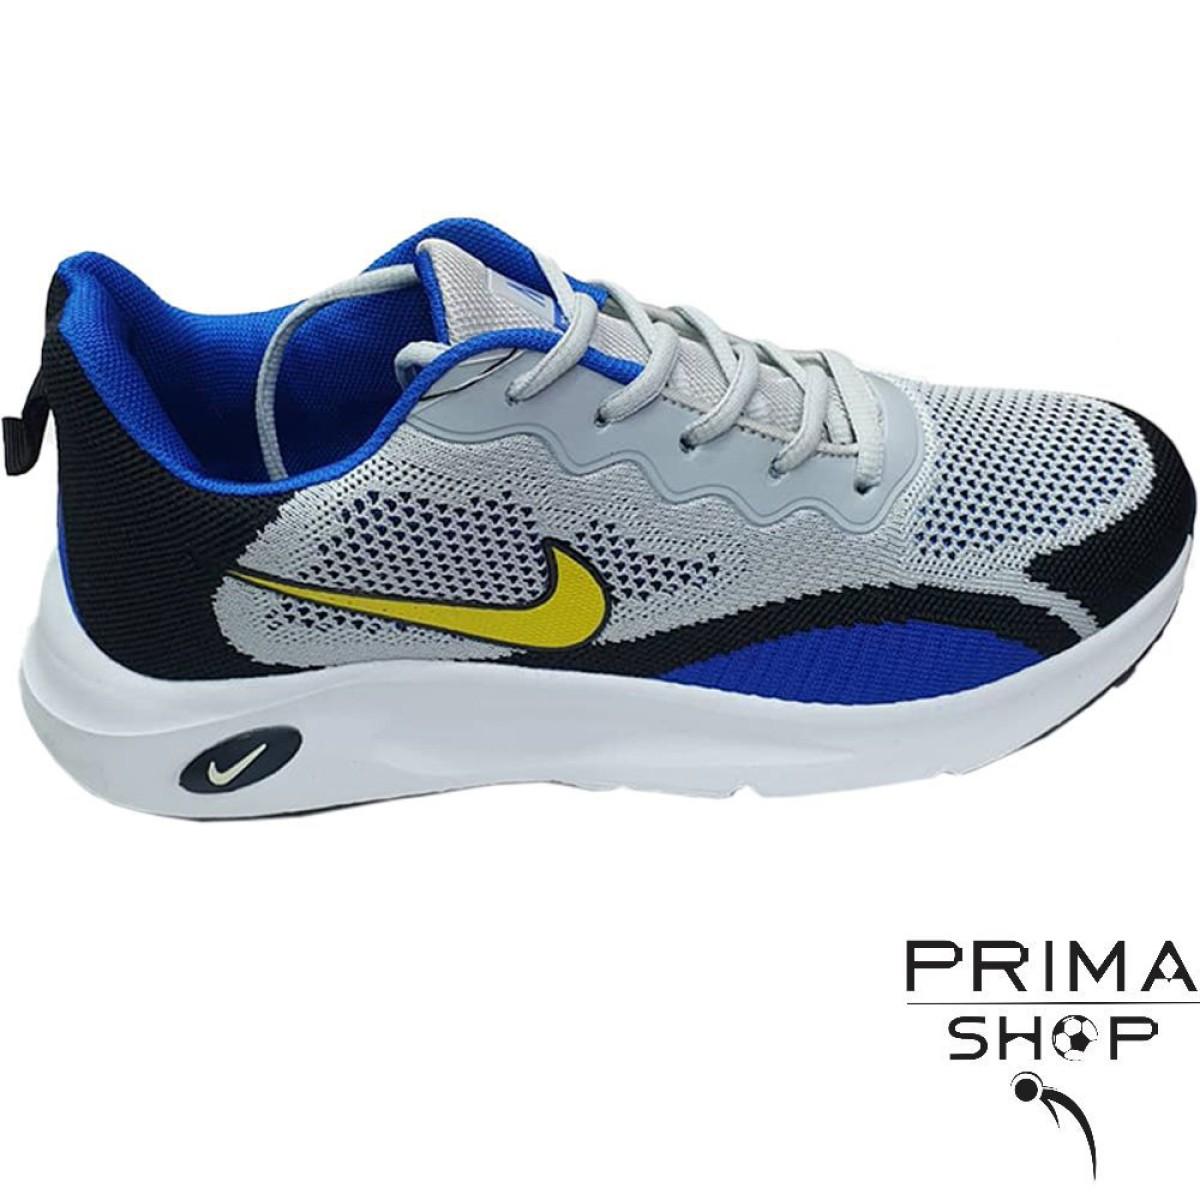 کفش اسپرت نایک مردانه کد 11 (های کپی)